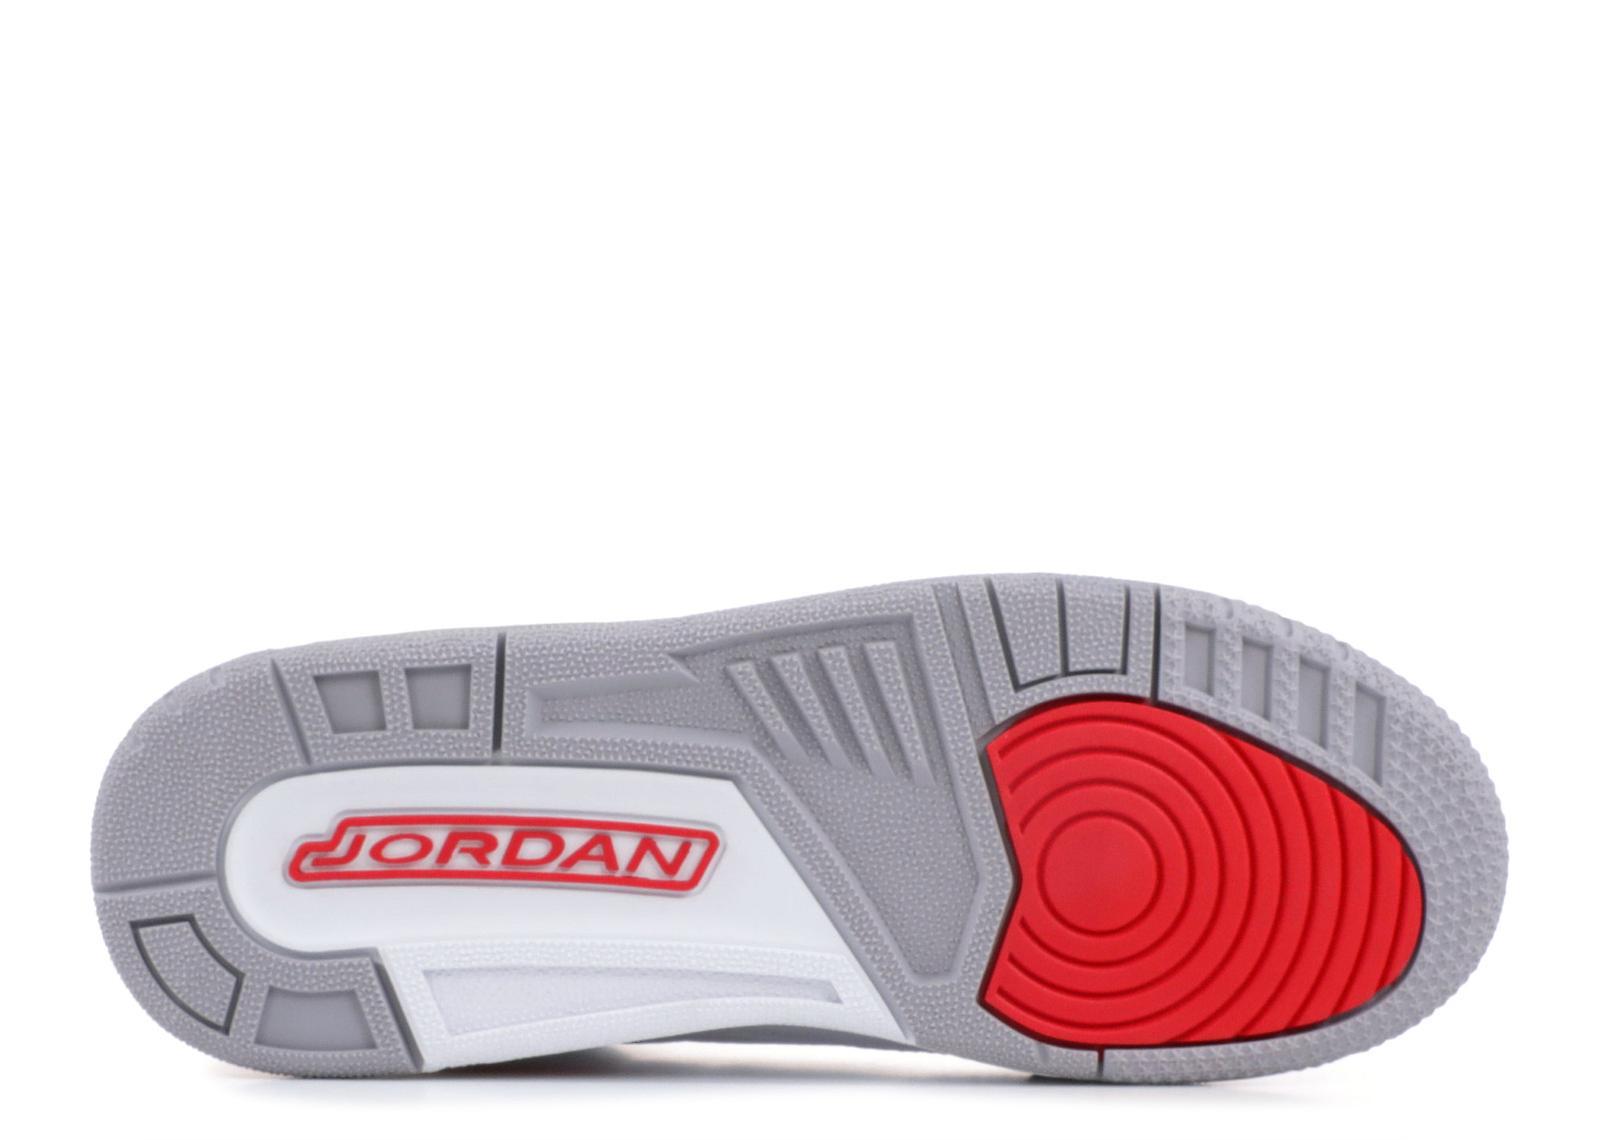 5f821be35ea Air Jordan 3 Retro Bg 'Katrina' - 398614-116 - Shoes | Fruugo